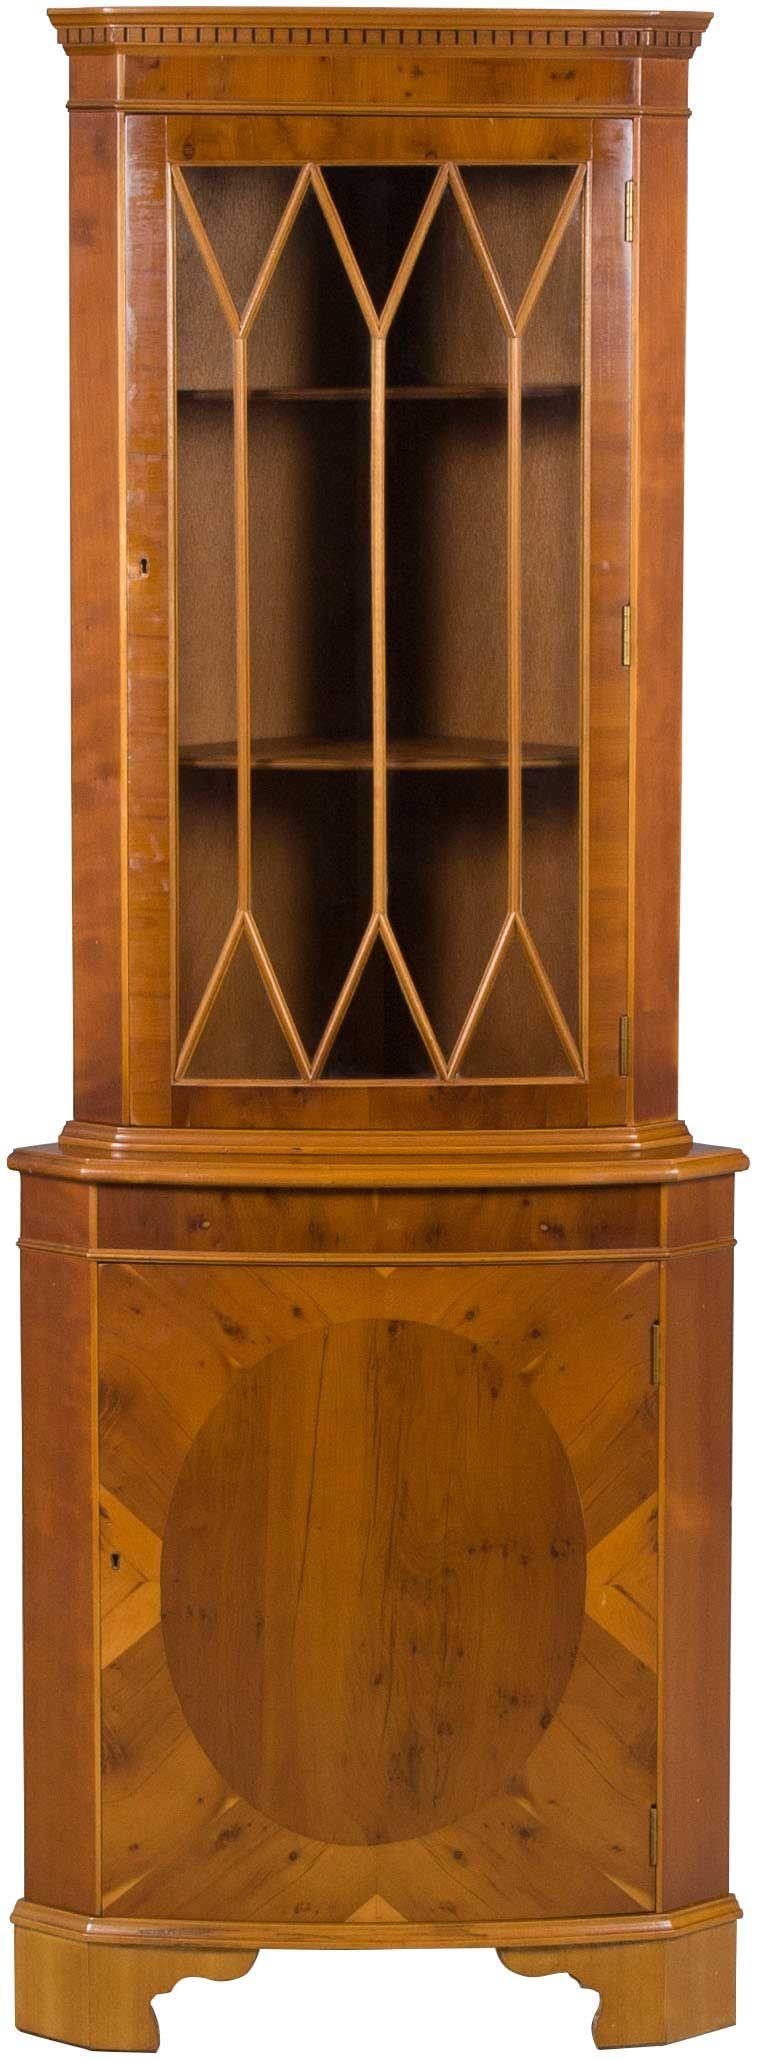 Ann mirror insert double door single drawer wooden corner cabinet - English Antique Style Yew Corner Cabinet